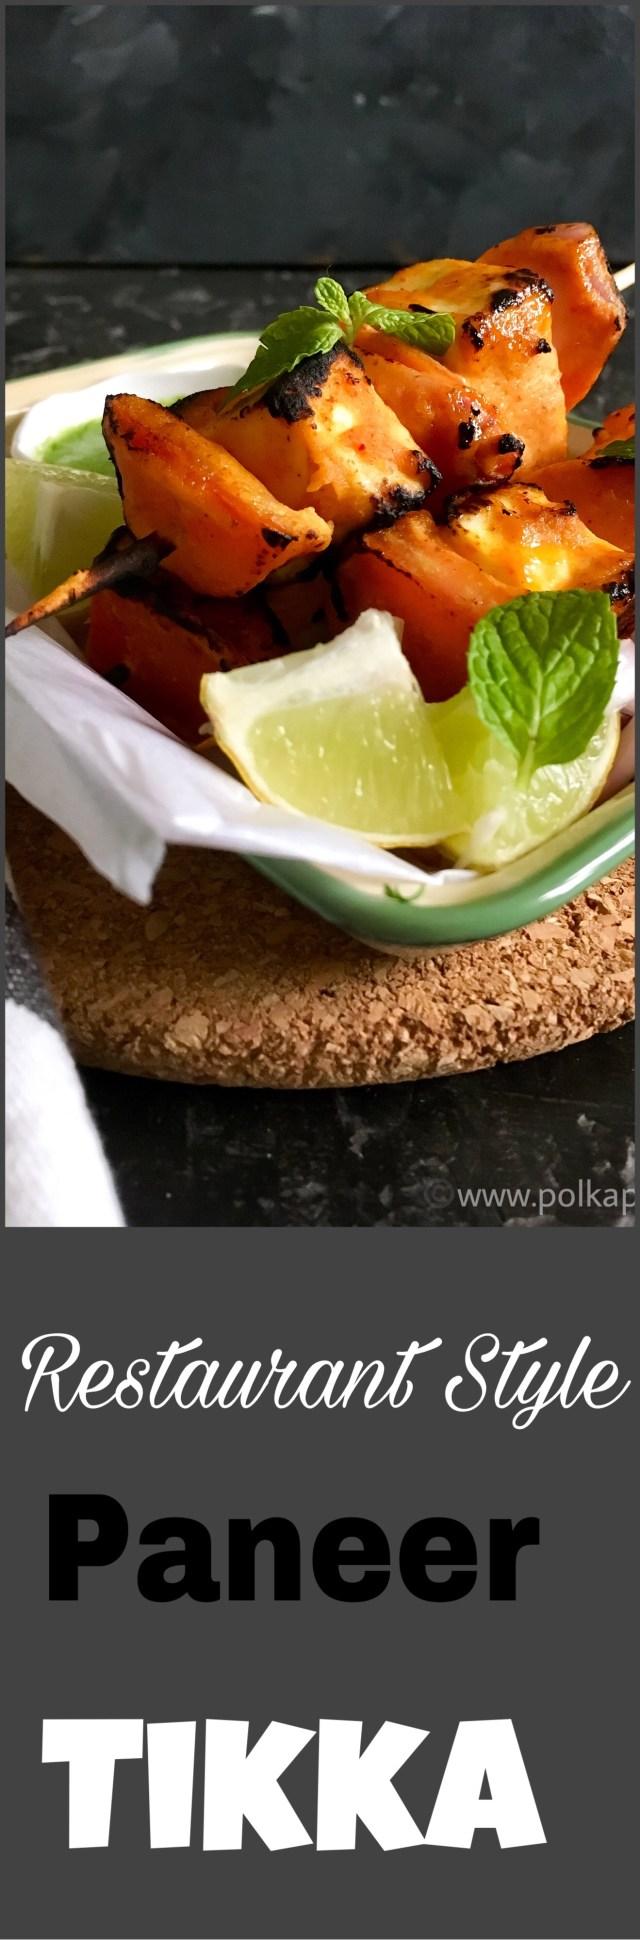 Restaurant Style Paneer Tikka | Stove Top Method